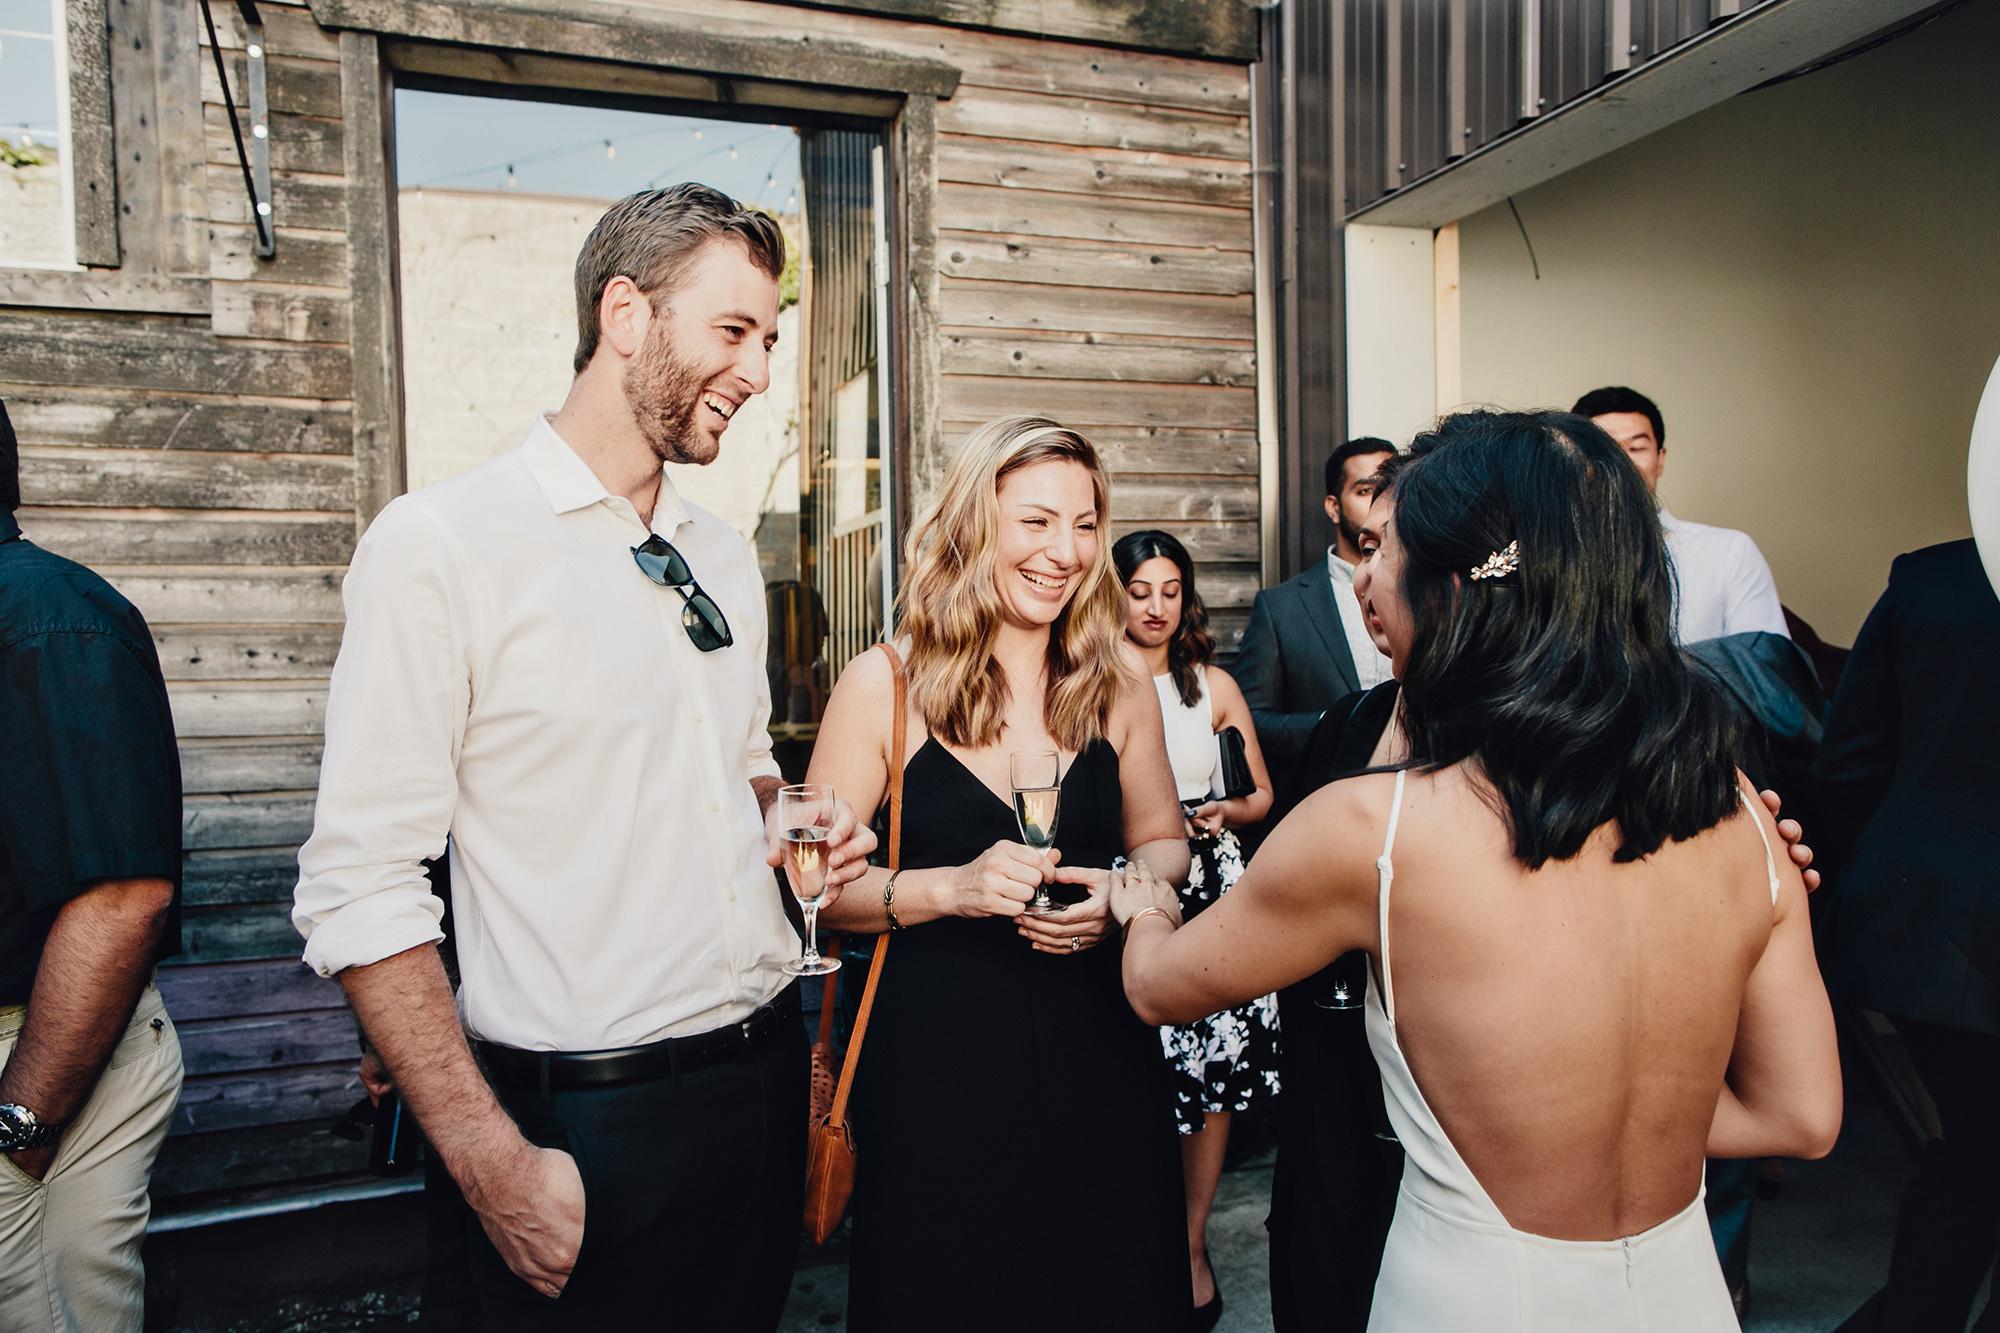 Bonaccord-Vancouver-Wedding-0057.JPG